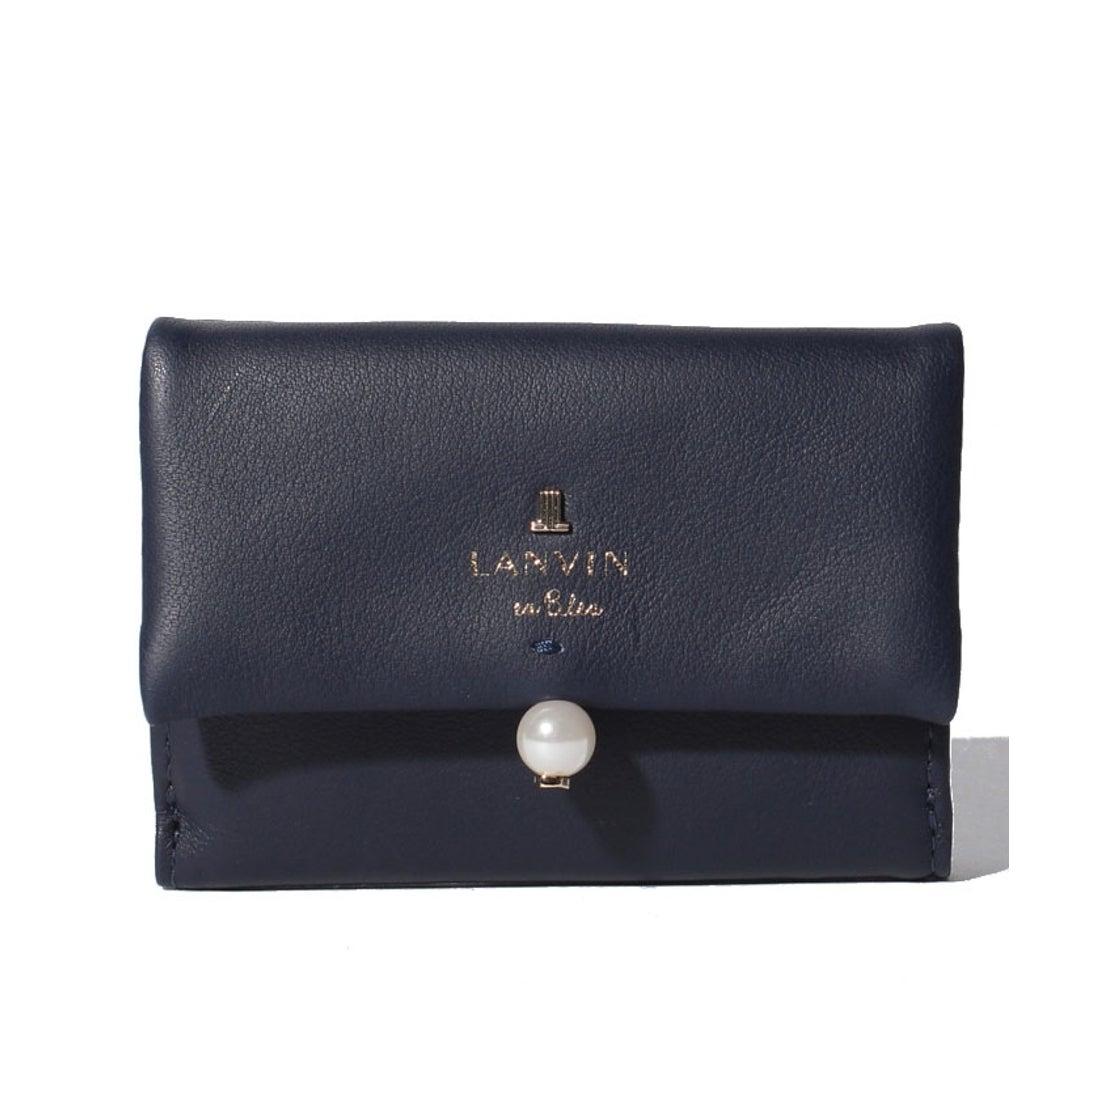 b2f8da658260 ランバン オン ブルー LANVIN en Bleu シャペル 3つ折りミニ財布 (ディープブルー) -靴&ファッション通販  ロコンド〜自宅で試着、気軽に返品